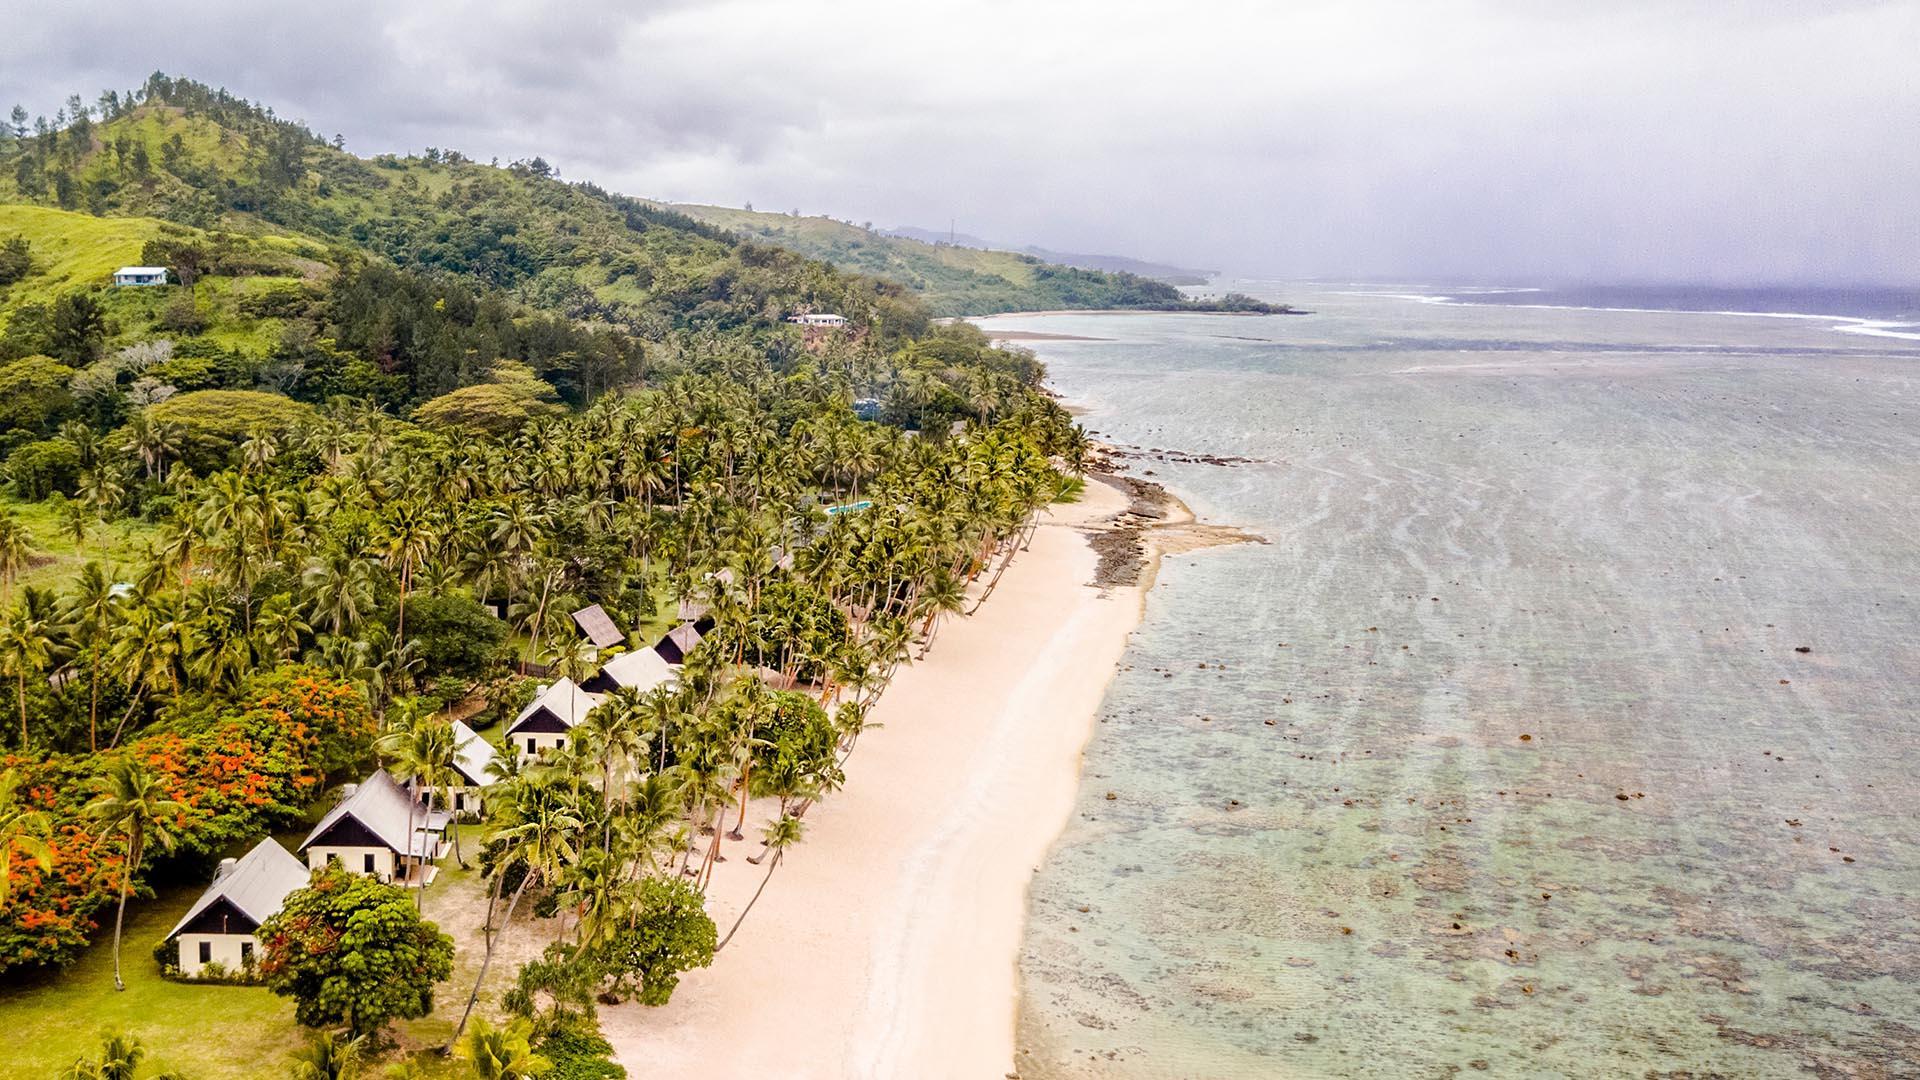 Fiji Bungalows by the Beach